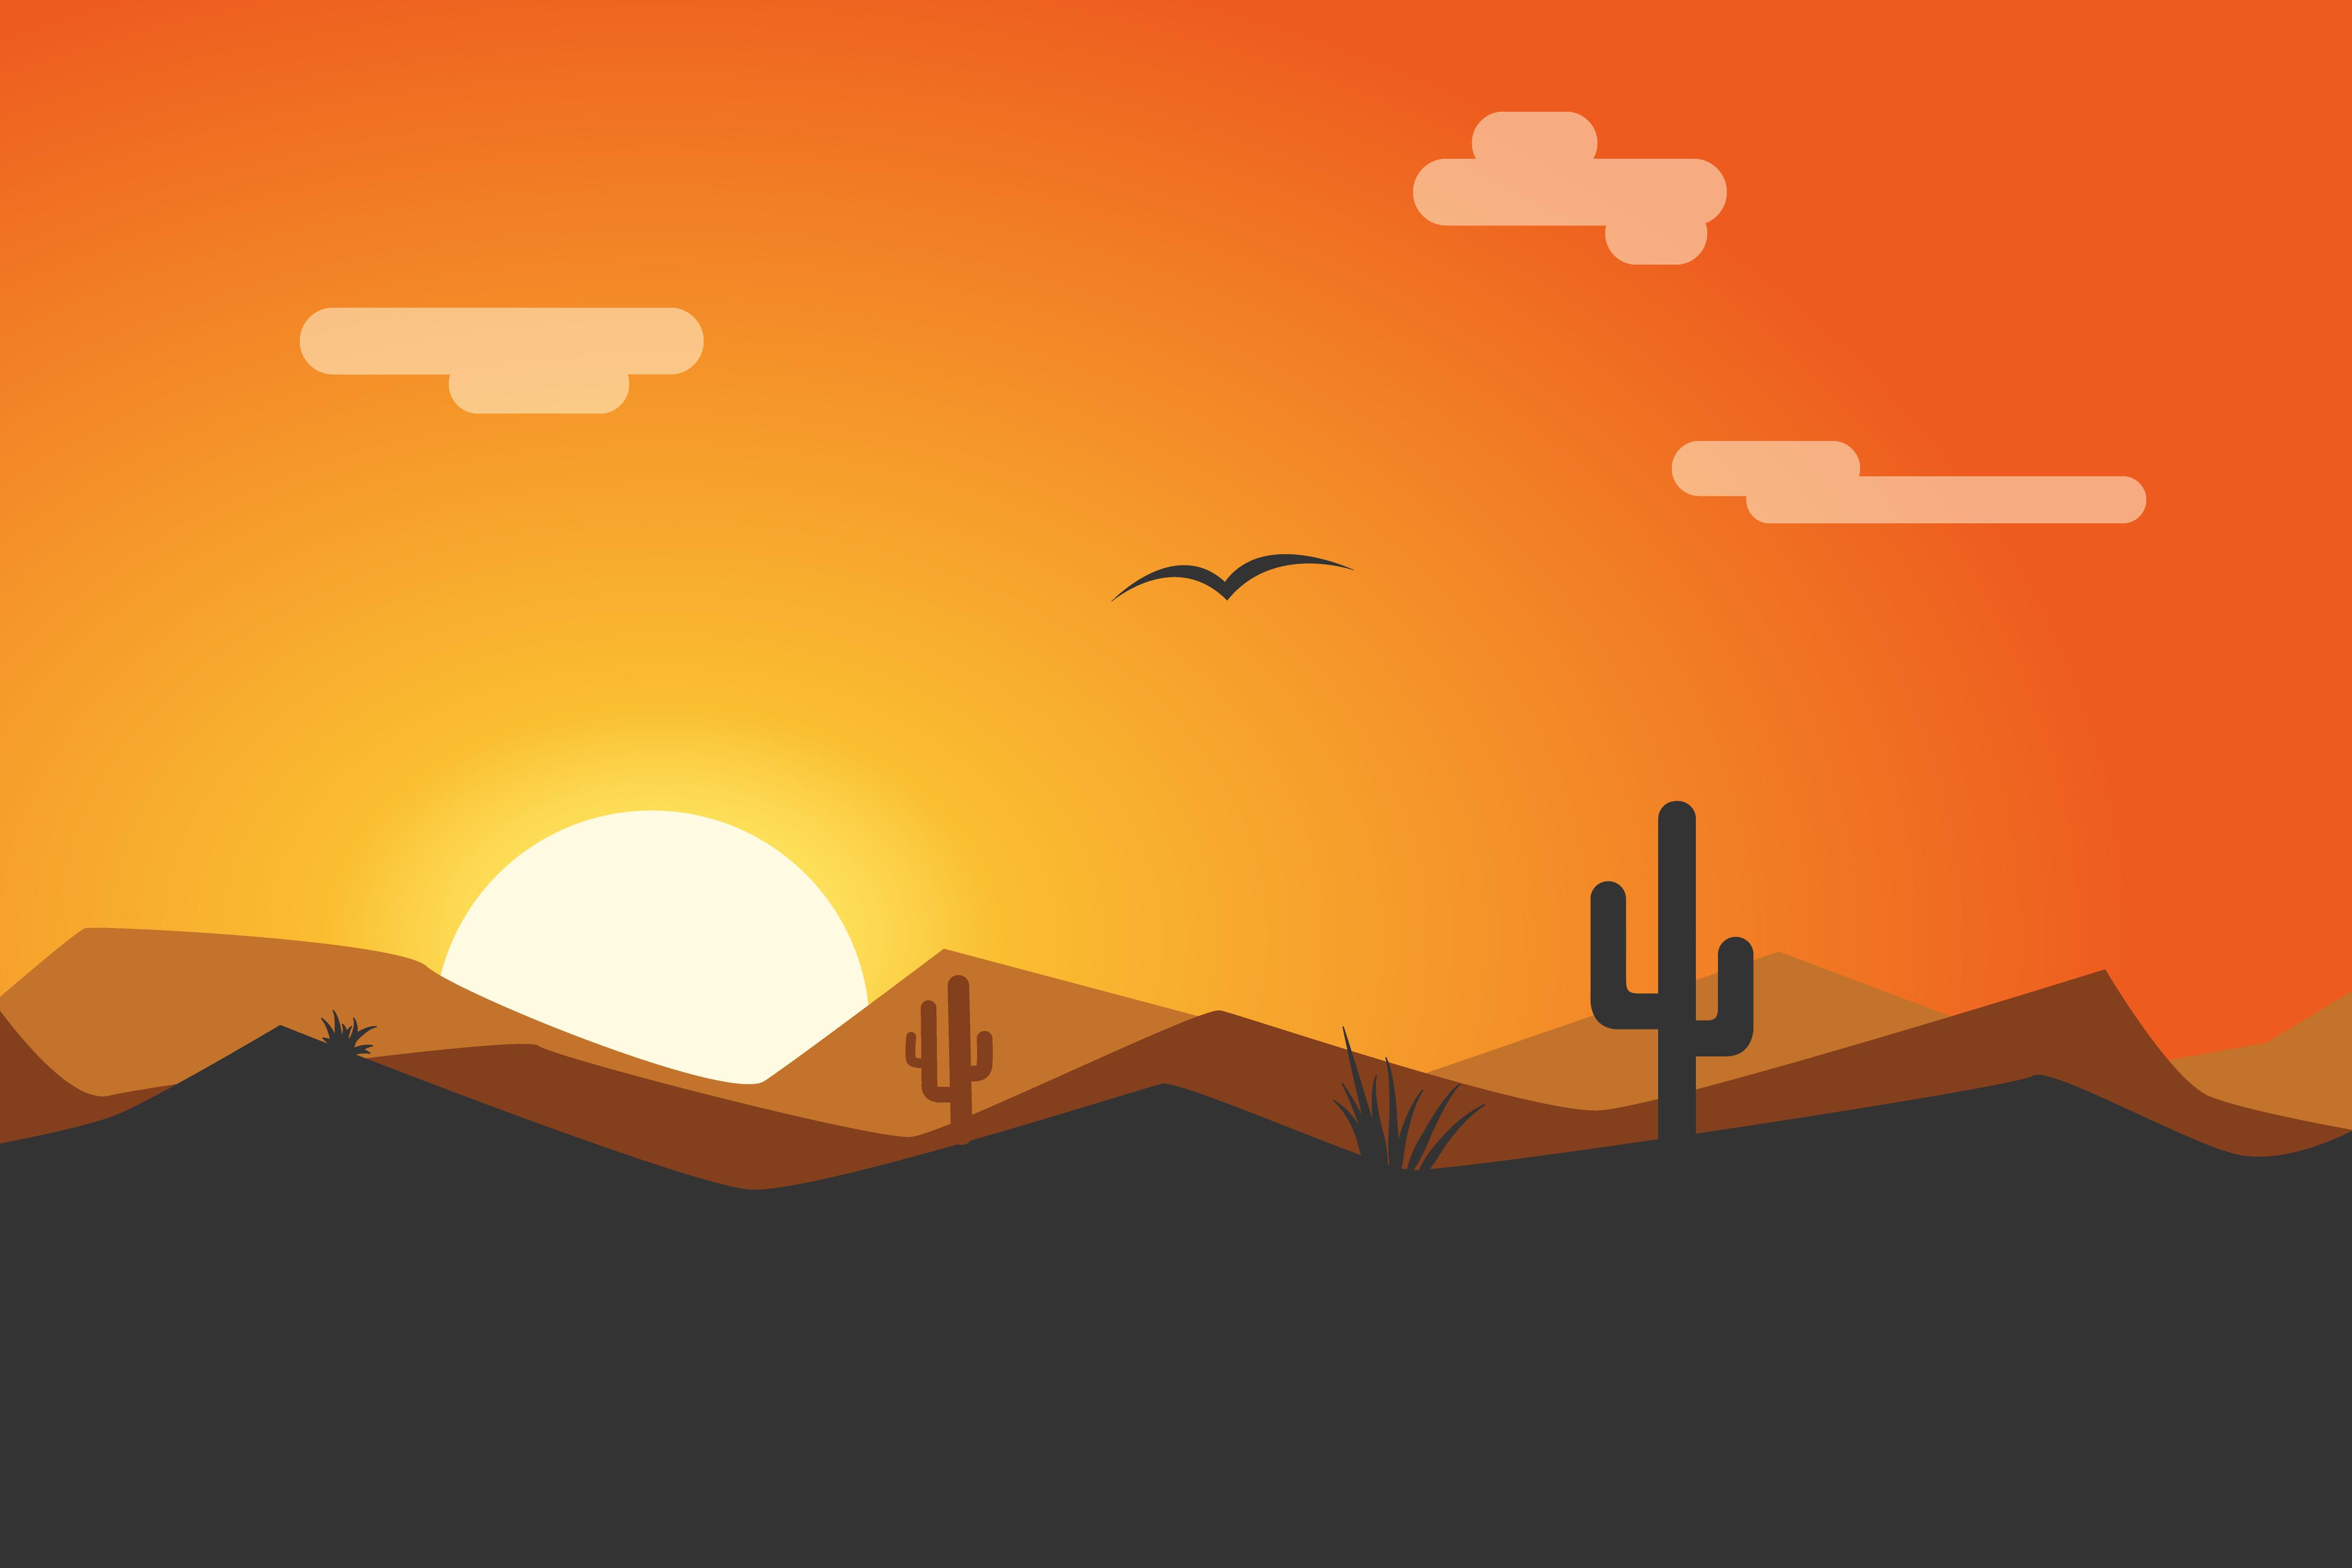 Dribbble - Desert-Sunset.png by Sarah Thomson Sunset